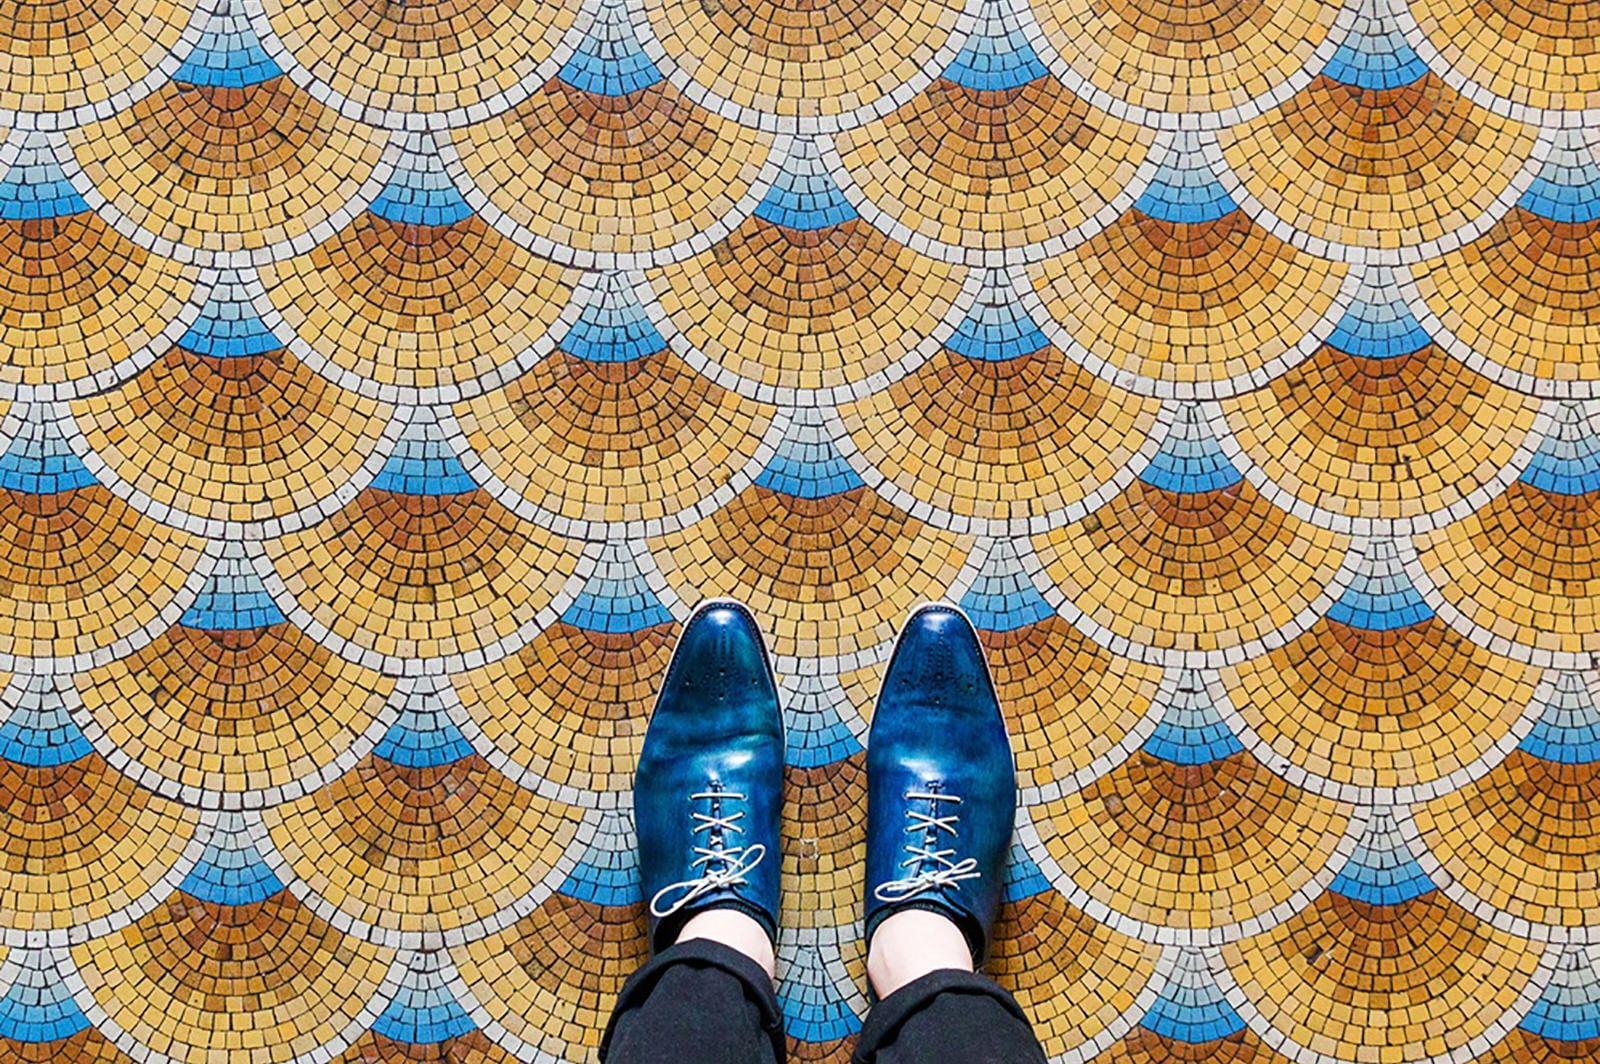 Parisian Floors. Ceramic at your feet